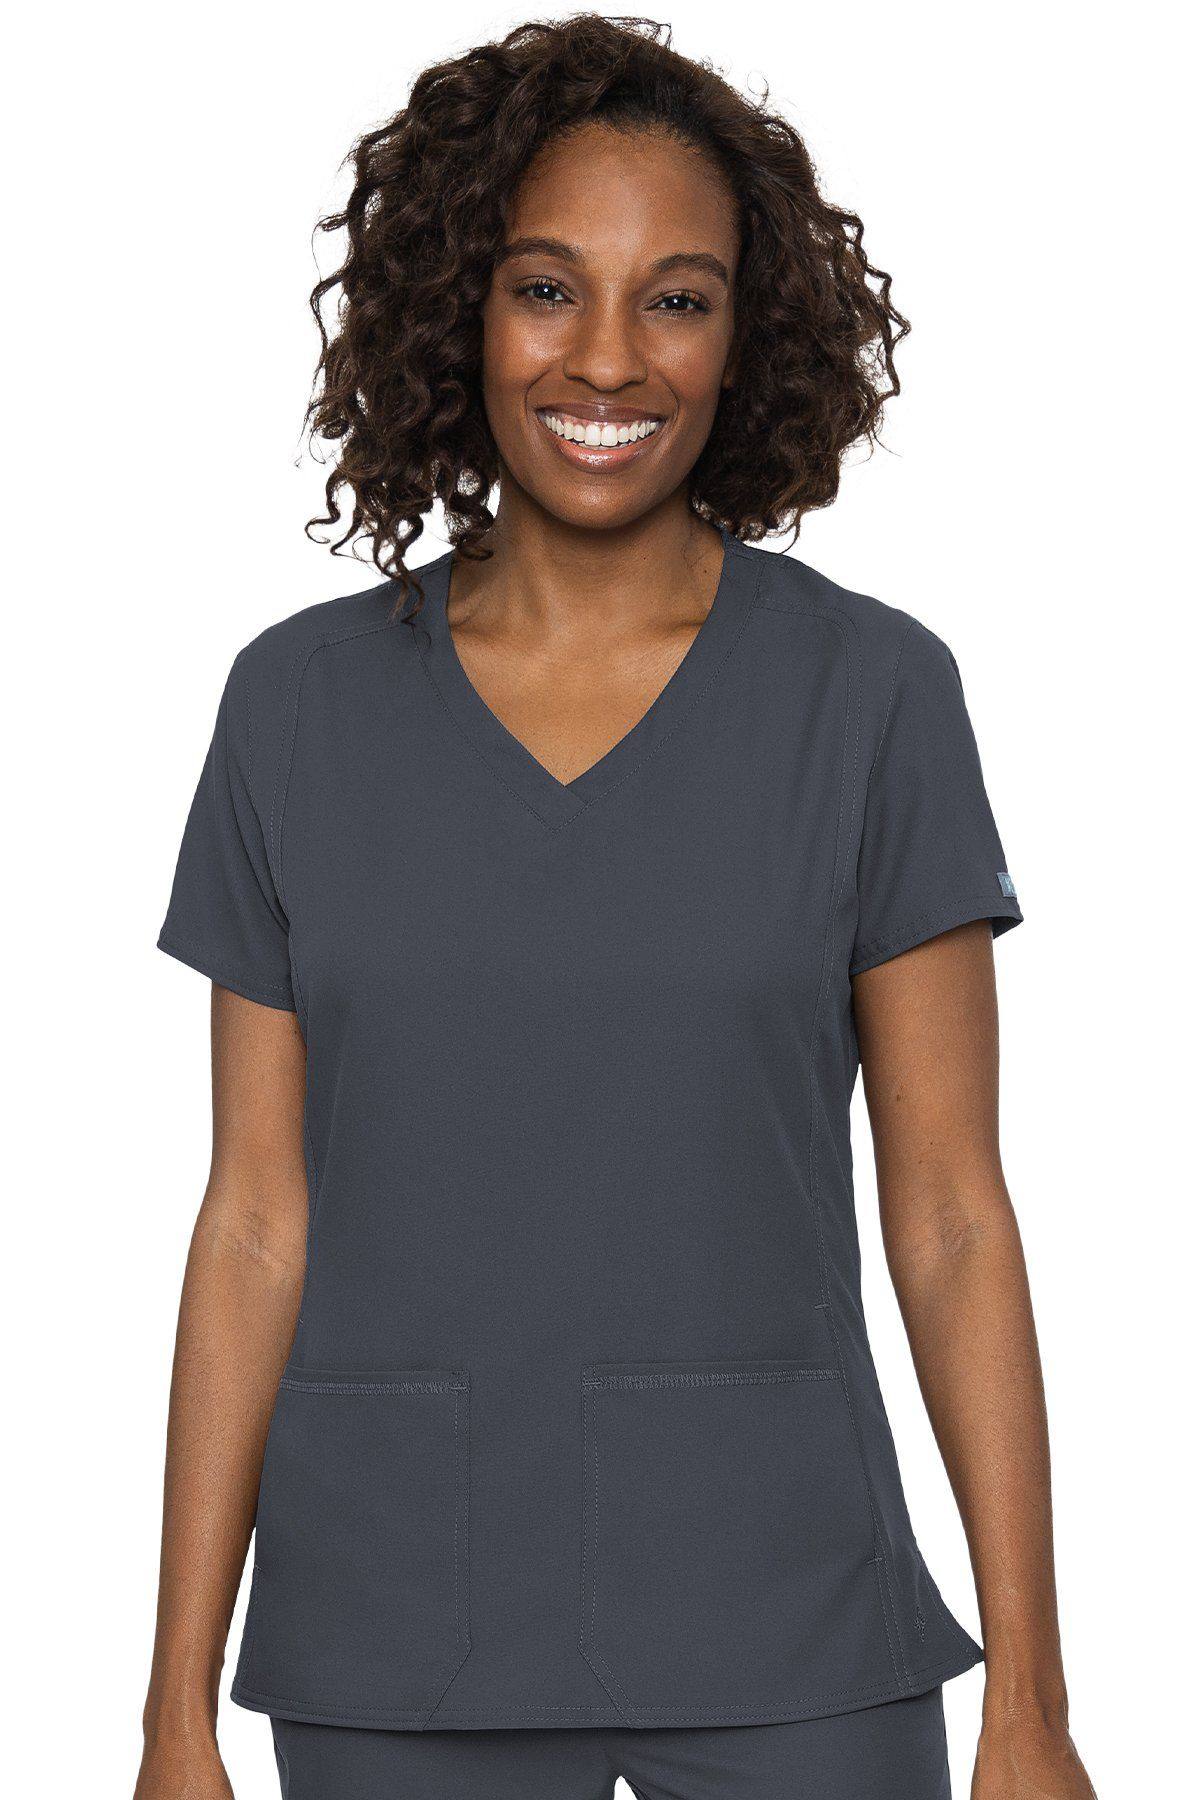 Med Couture Scrub Top Insight V-Neck Side Pocket - XL / Pewter